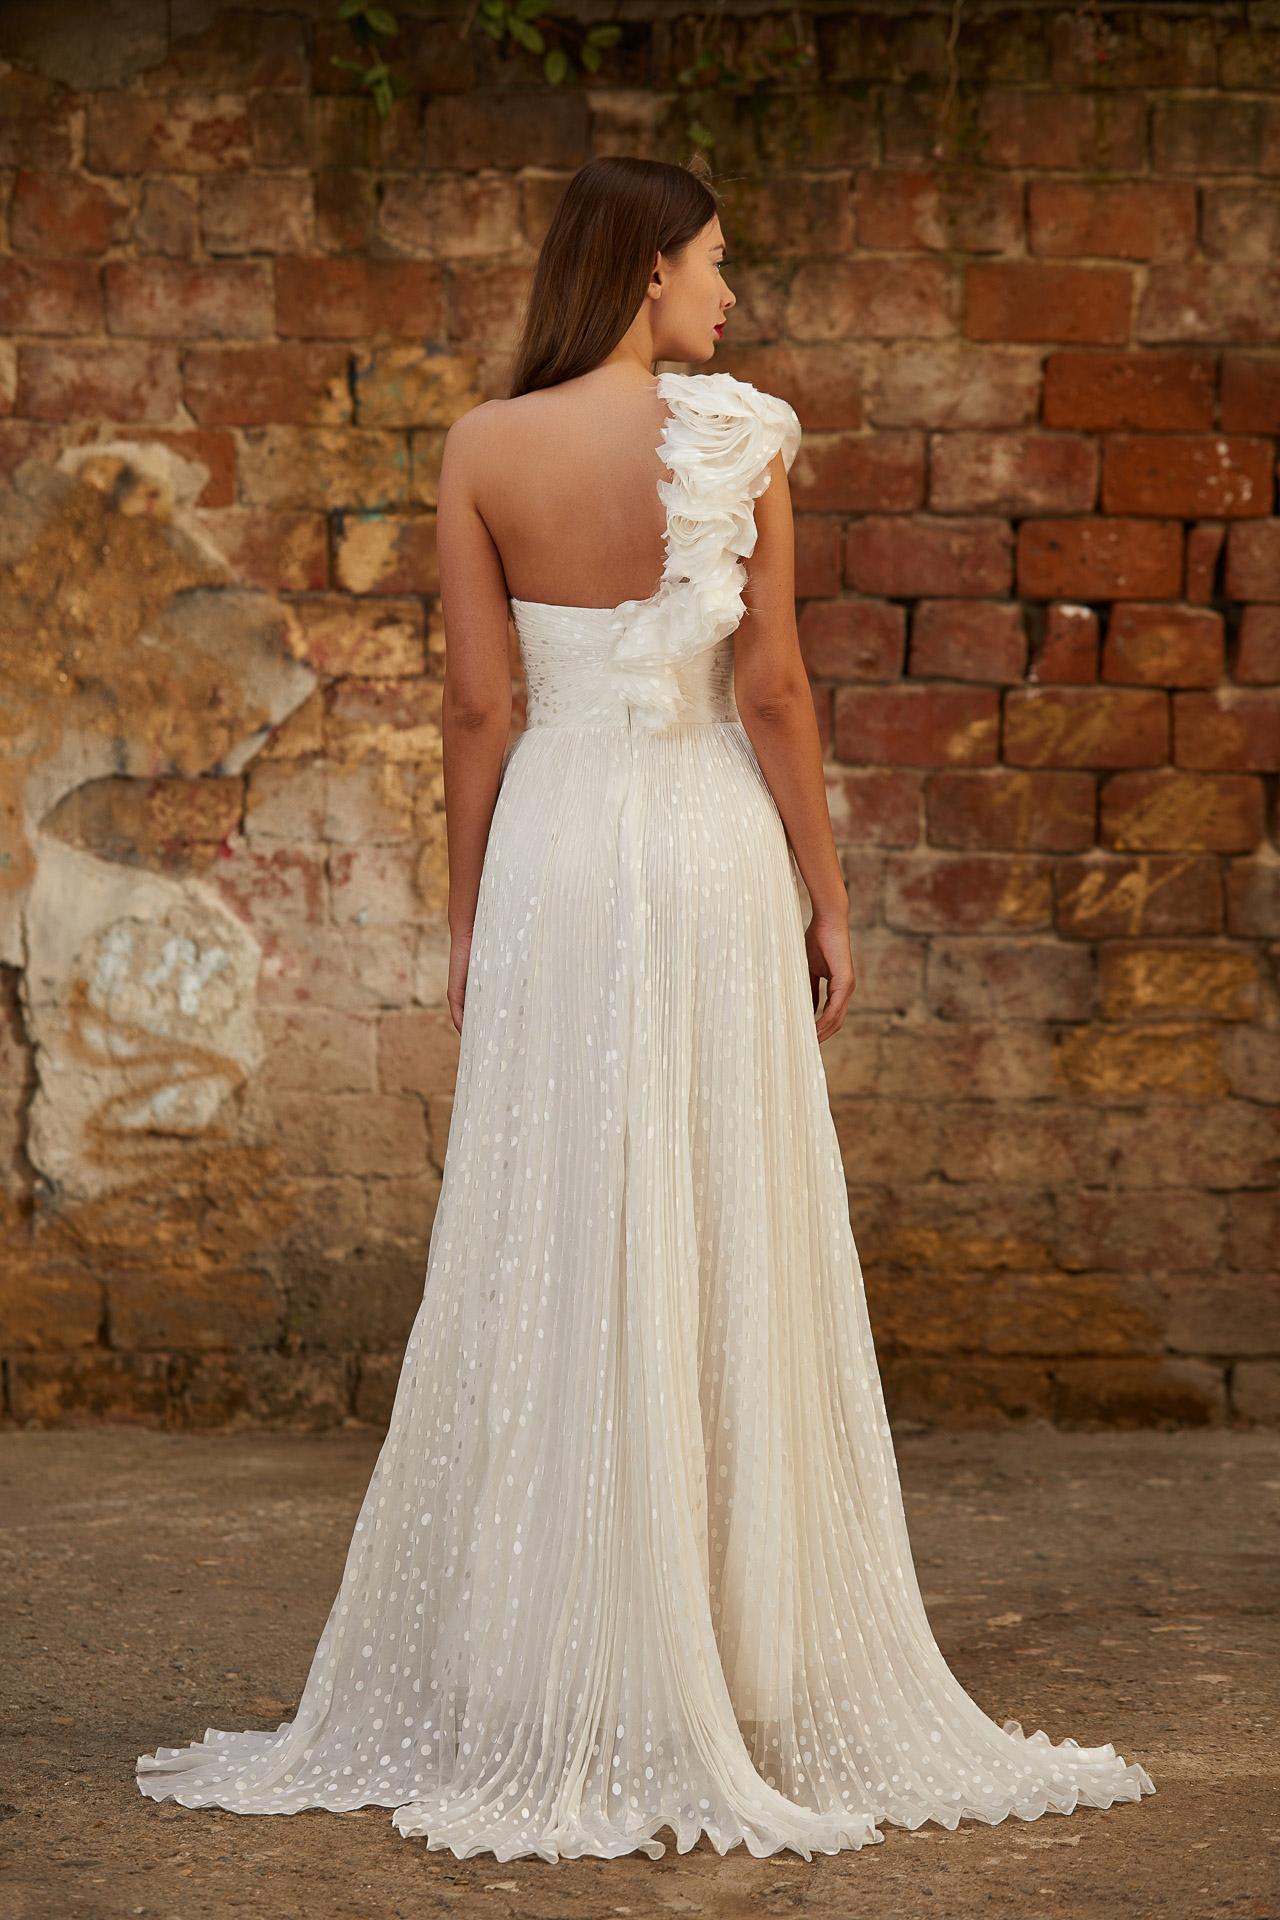 Sulk ruffles bridal gown